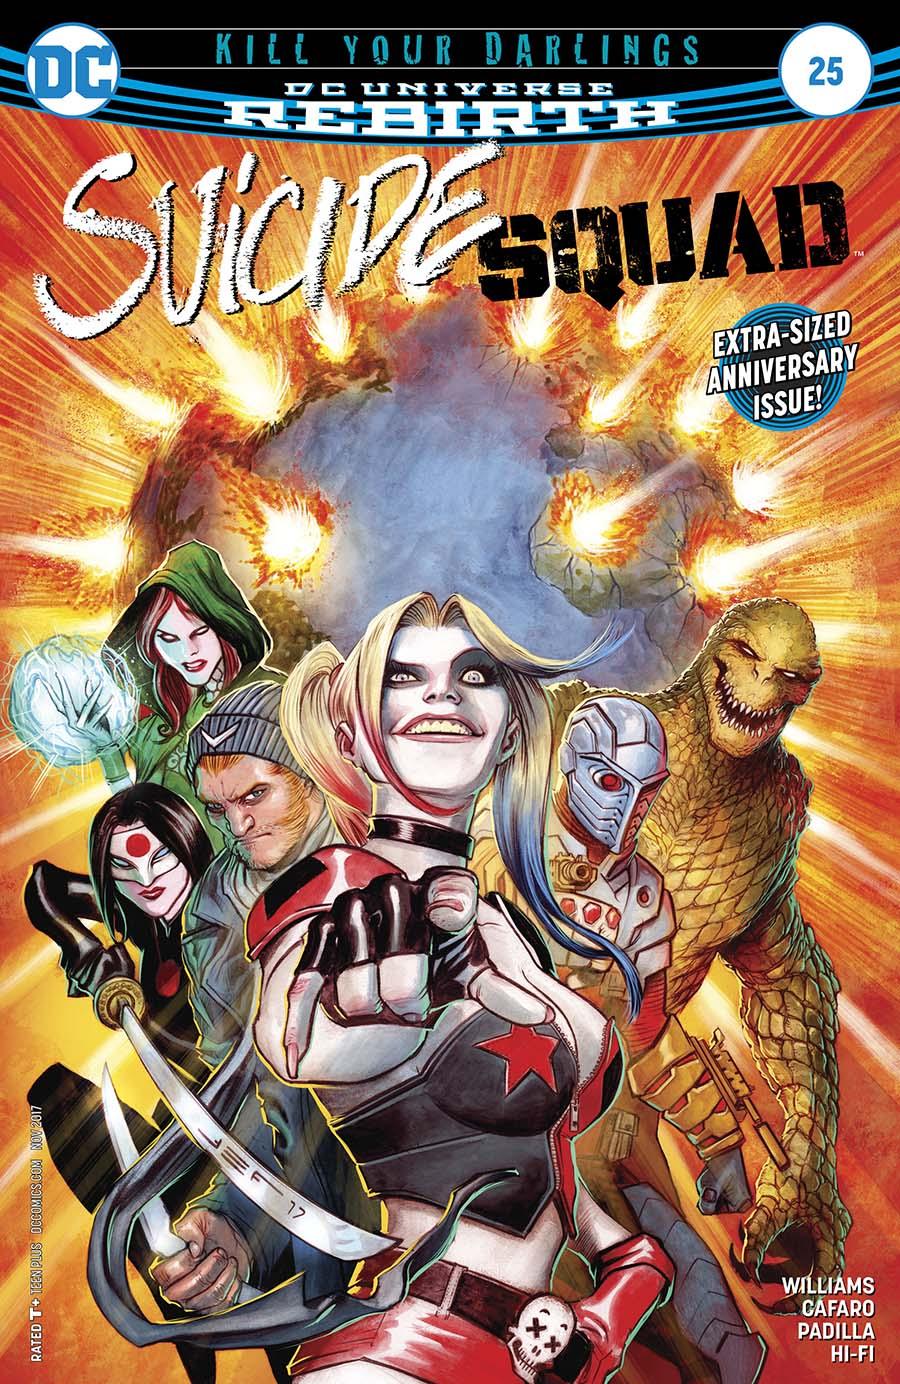 Suicide Squad Vol 4 #25 Cover A Regular Juan Ferreyra Cover